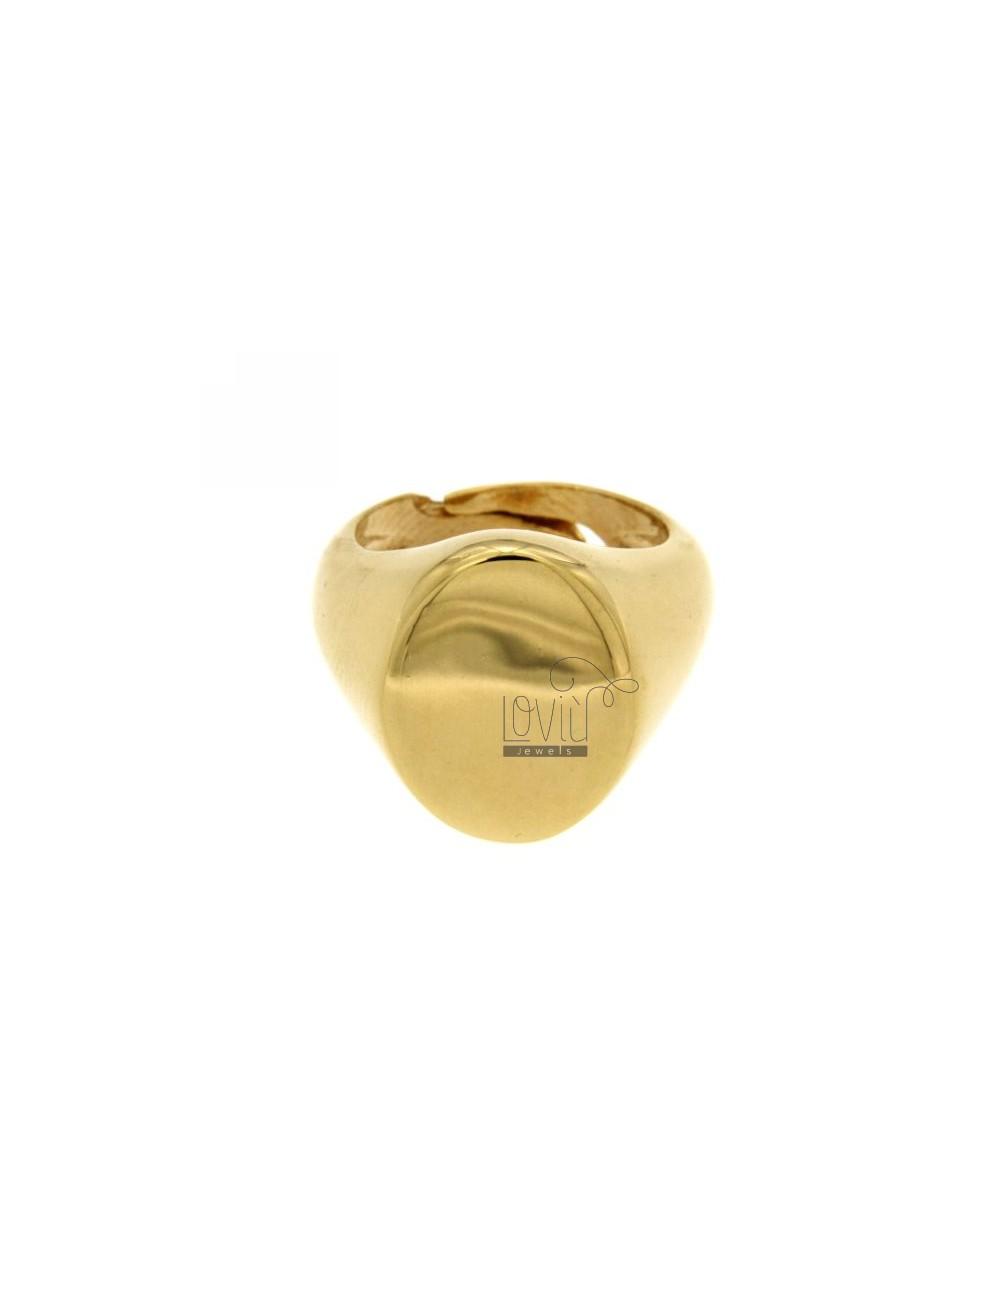 LITTLE FINGER RING ADJUSTABLE VERTICAL OVAL SILVER GOLD PLATED 925 ‰